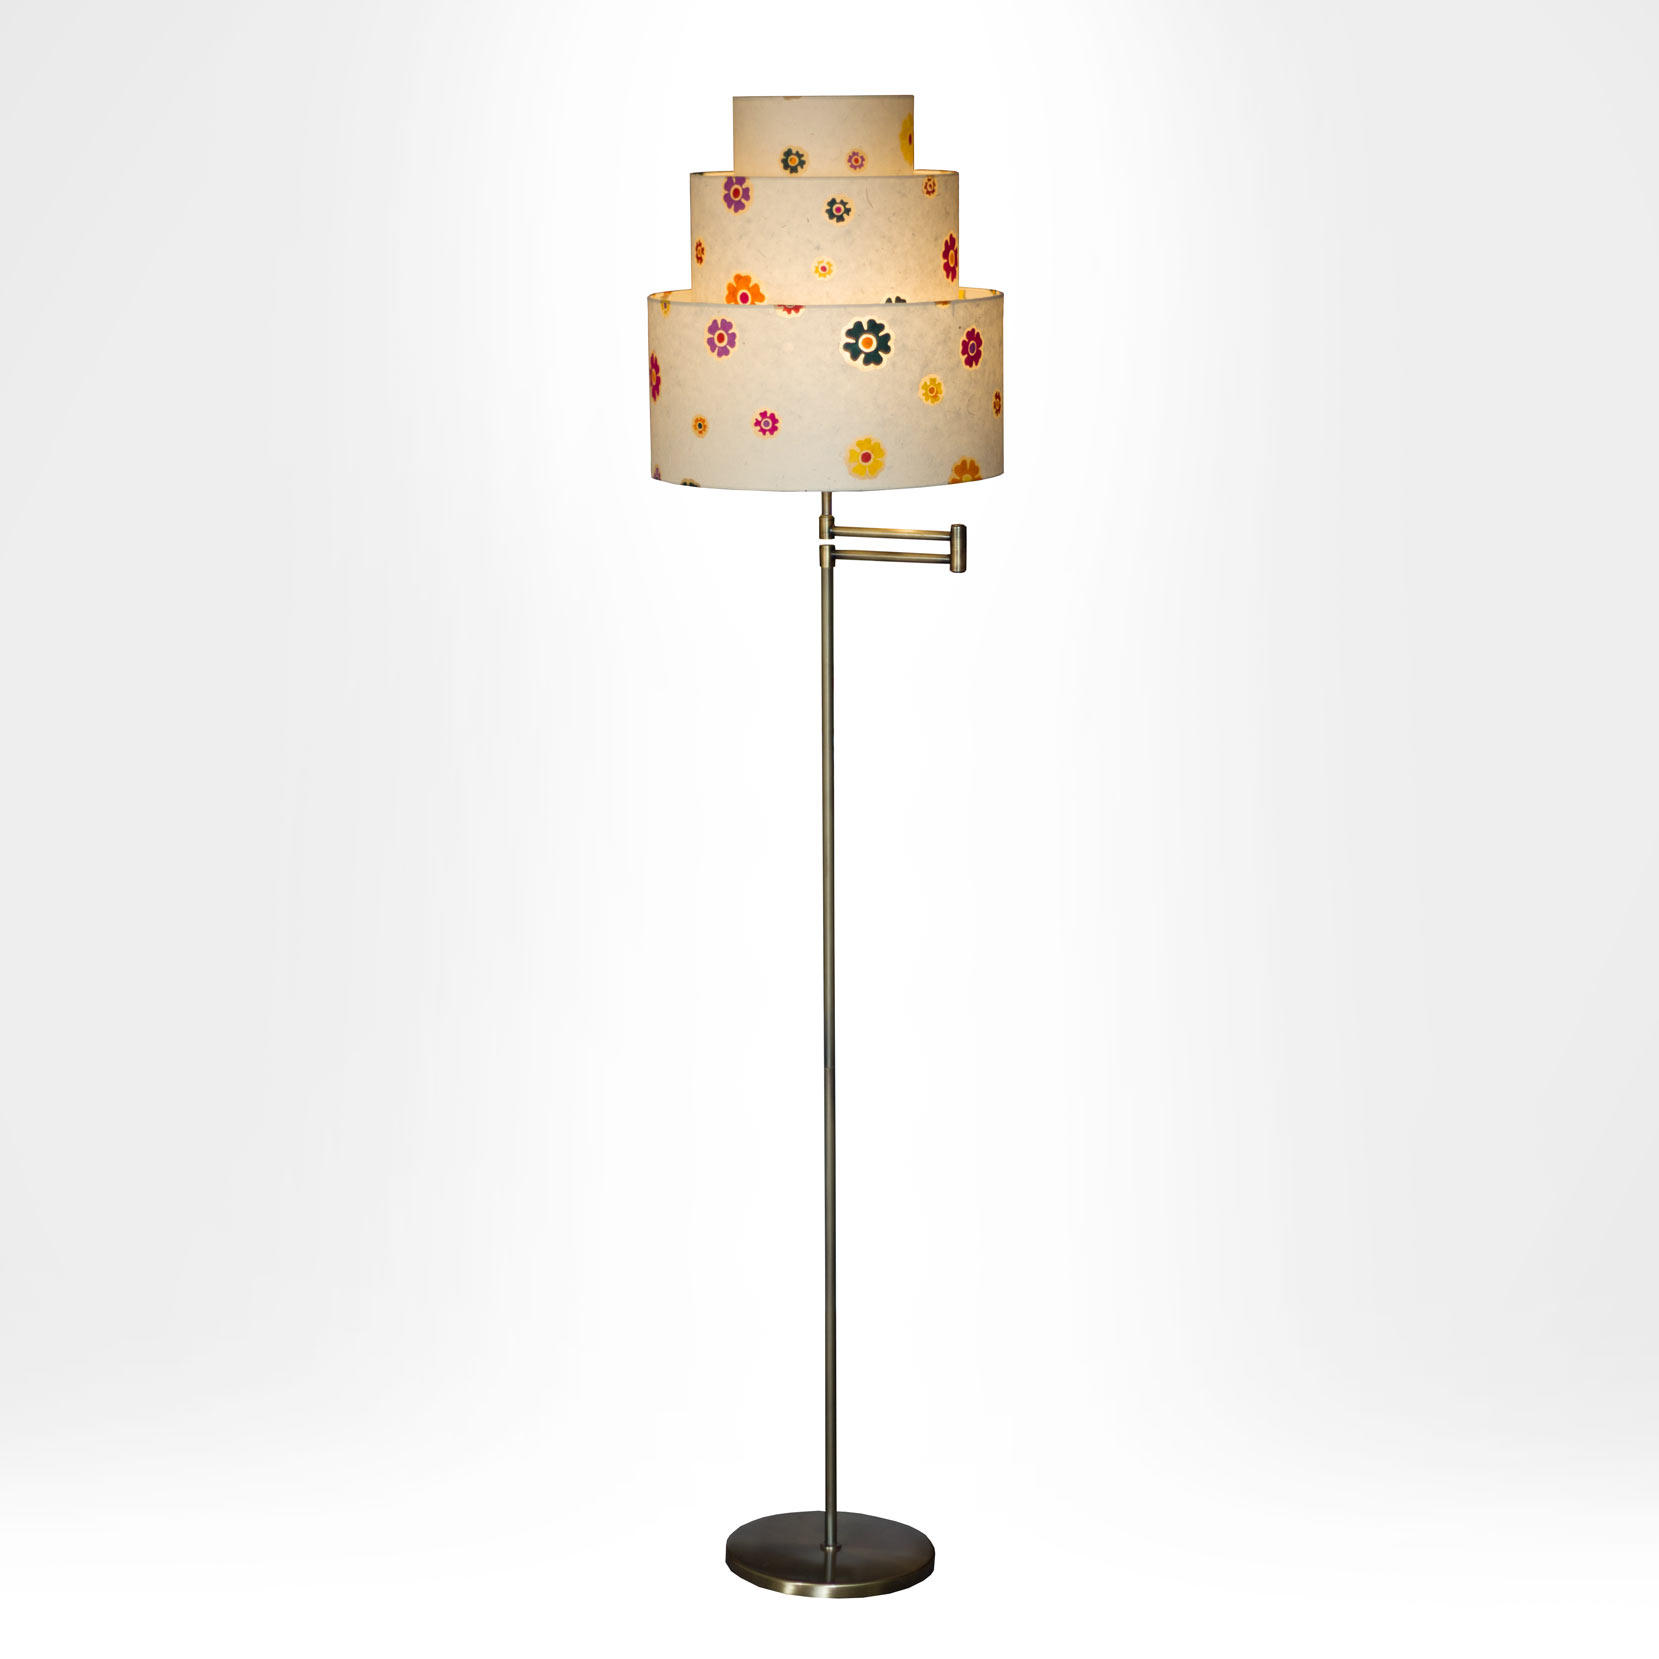 Handmade 3 Tier Lamp Shade on Double Swing Arm Floor Lamp